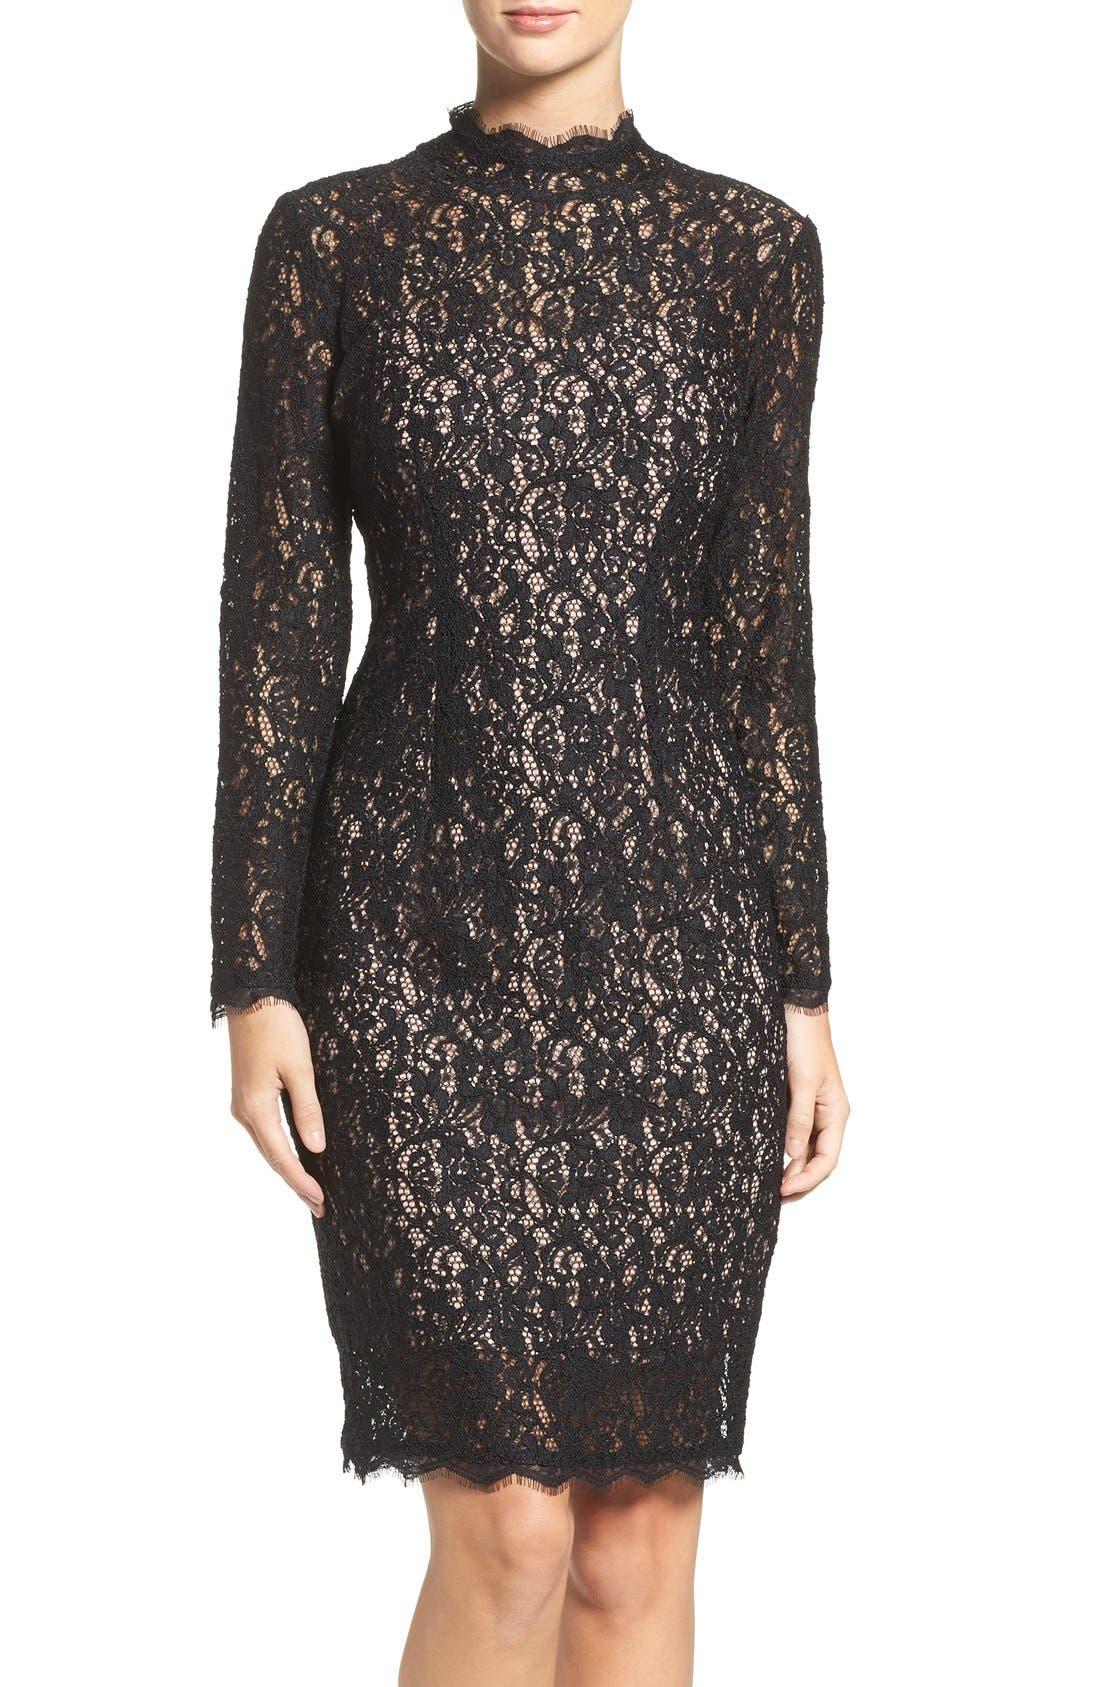 Alternate Image 1 Selected - Adrianna Papell Corded Lace Sheath Dress (Regular & Petite)